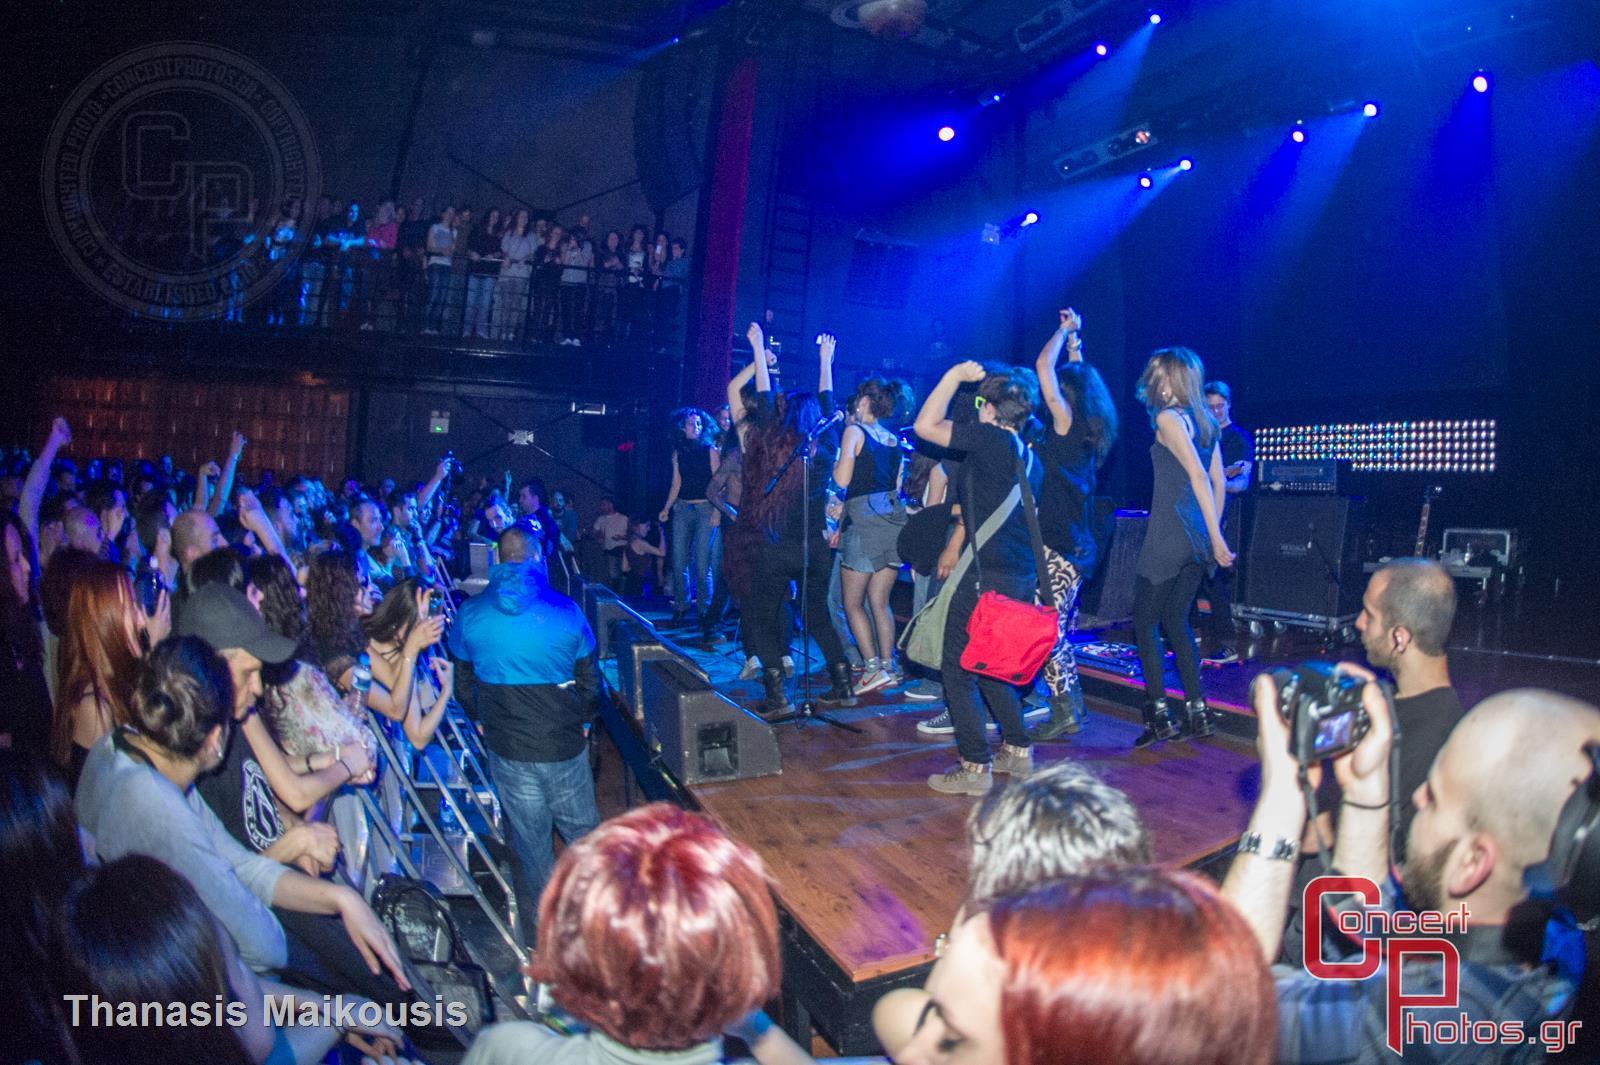 Tricky - Spectralfire-Tricky - Spectralfire photographer: Thanasis Maikousis - concertphotos_-4013